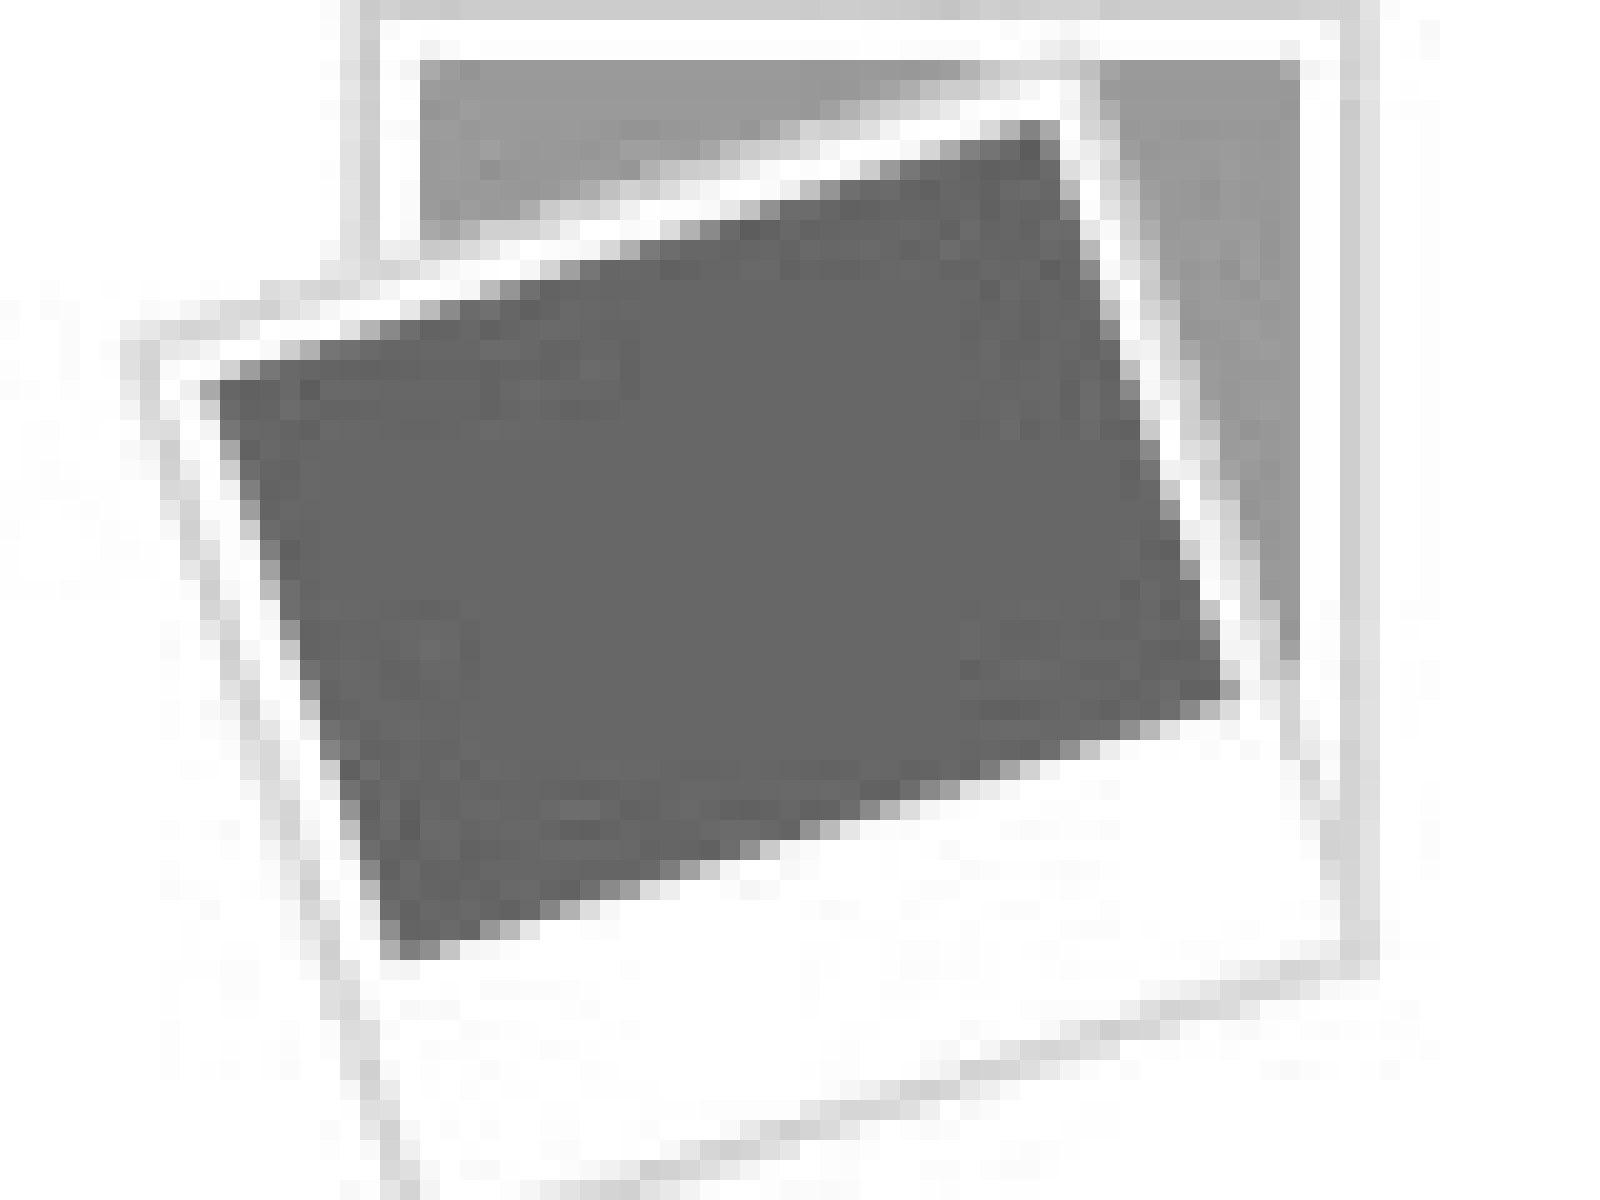 Landrover Defender LANDROVER FORWARD CONTROL 11B Auction sale